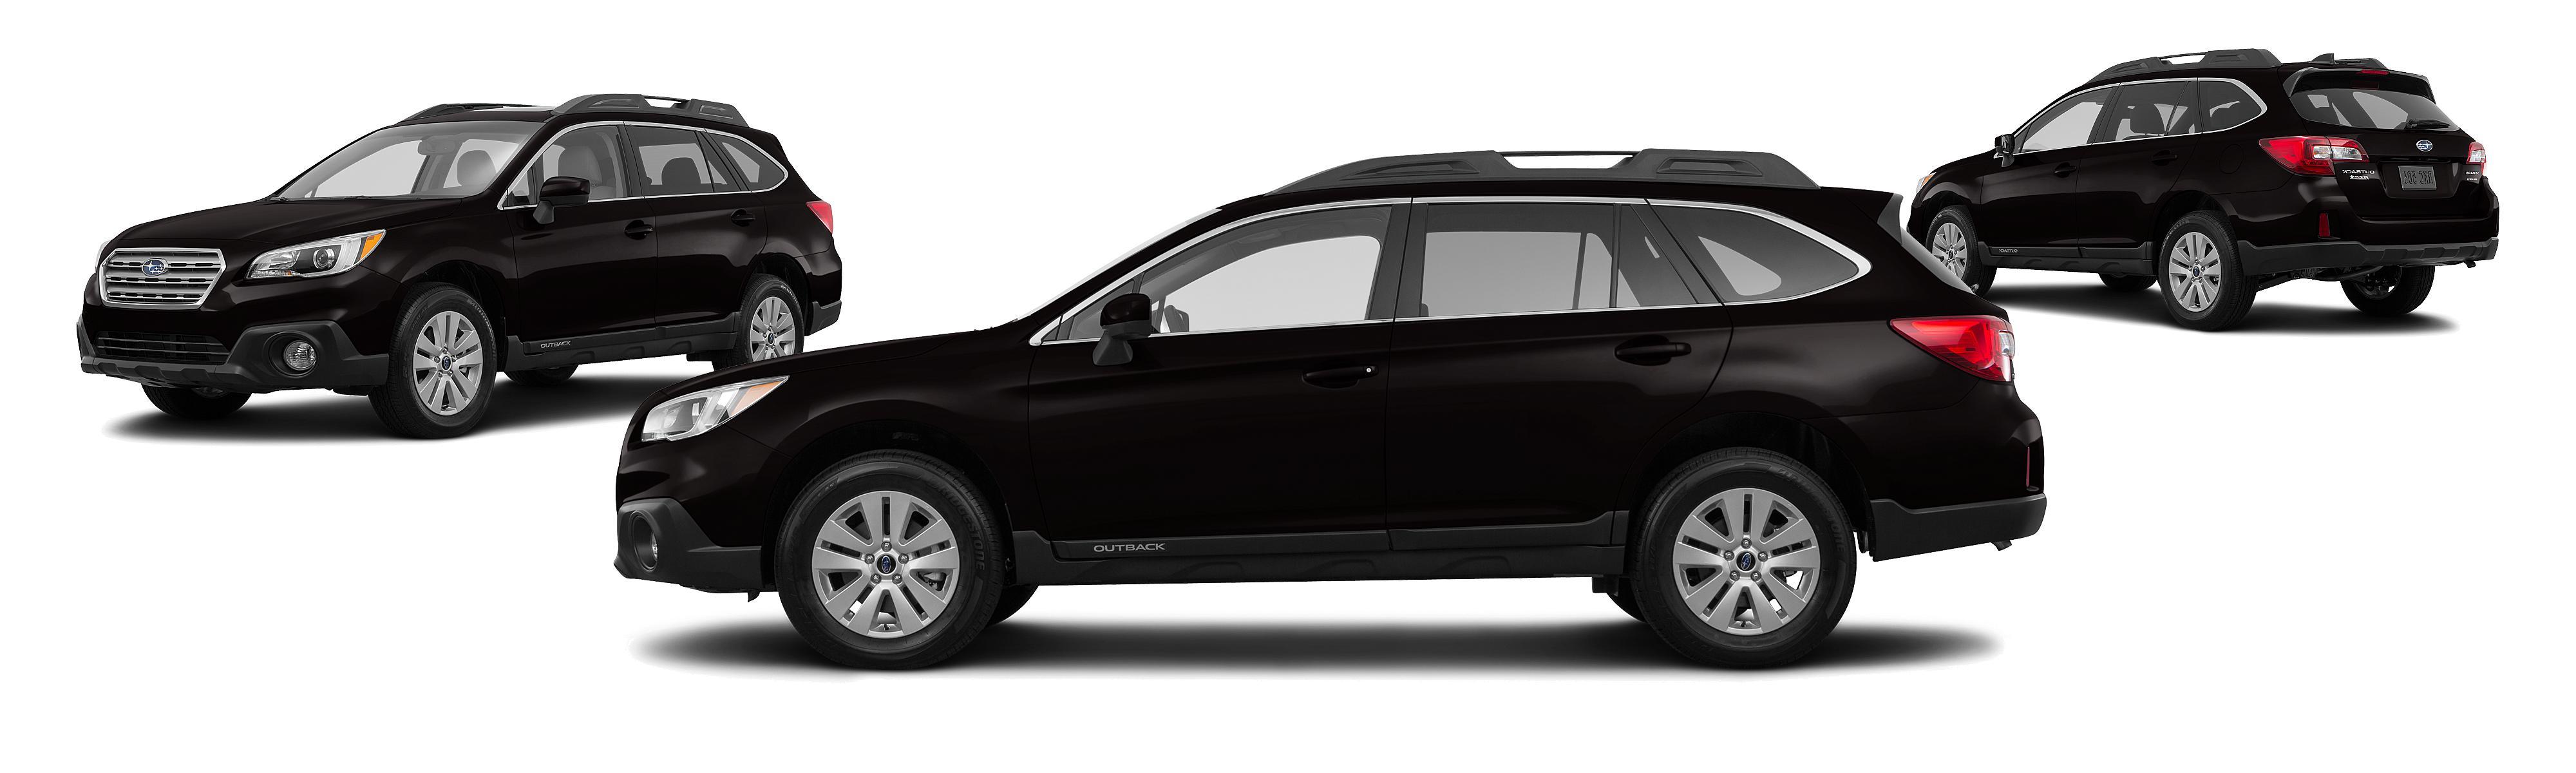 2017 outback premium best new cars for 2018. Black Bedroom Furniture Sets. Home Design Ideas